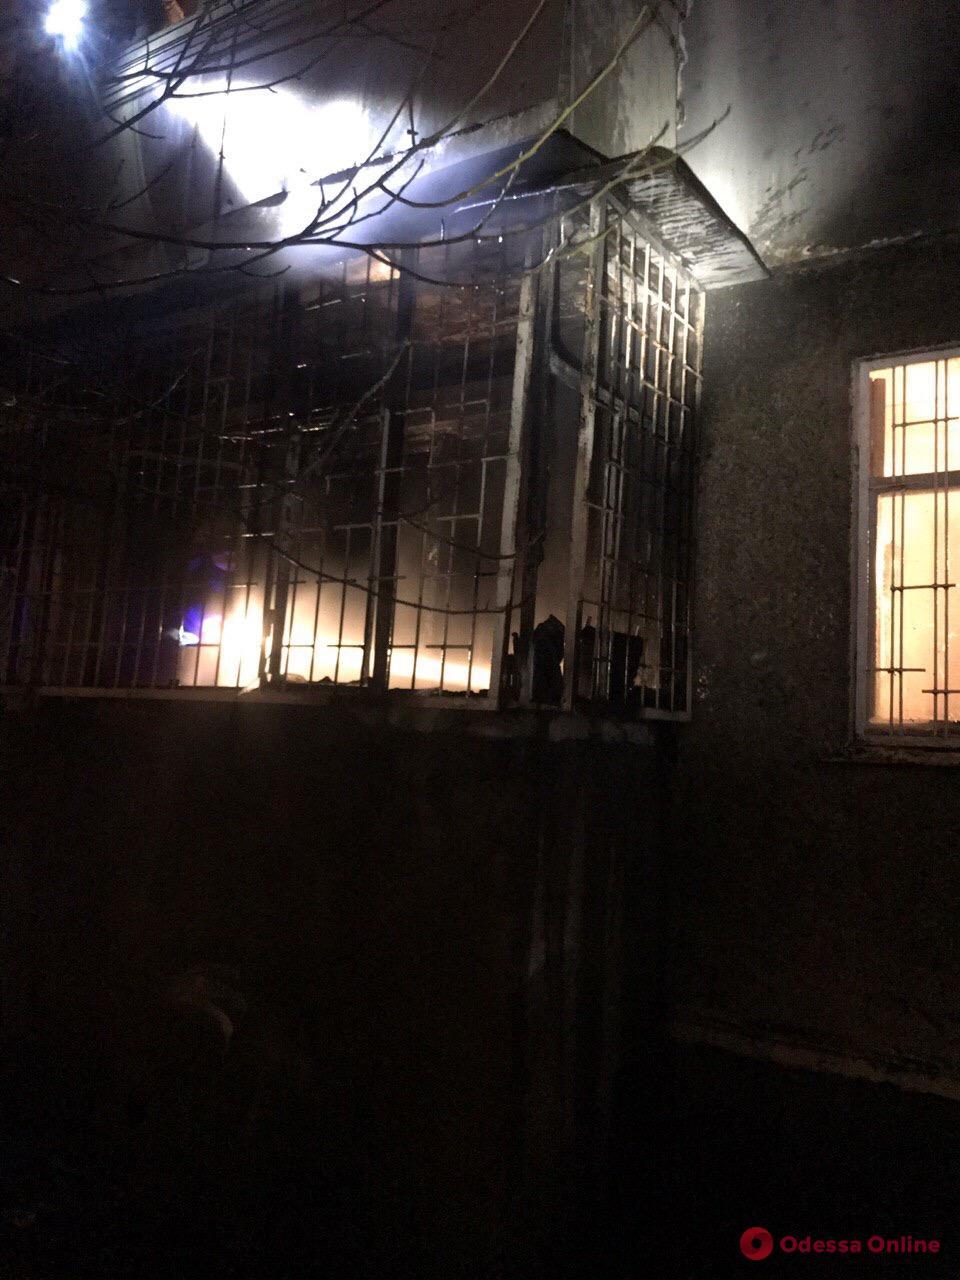 Одесса: на Таирова горела пятиэтажка